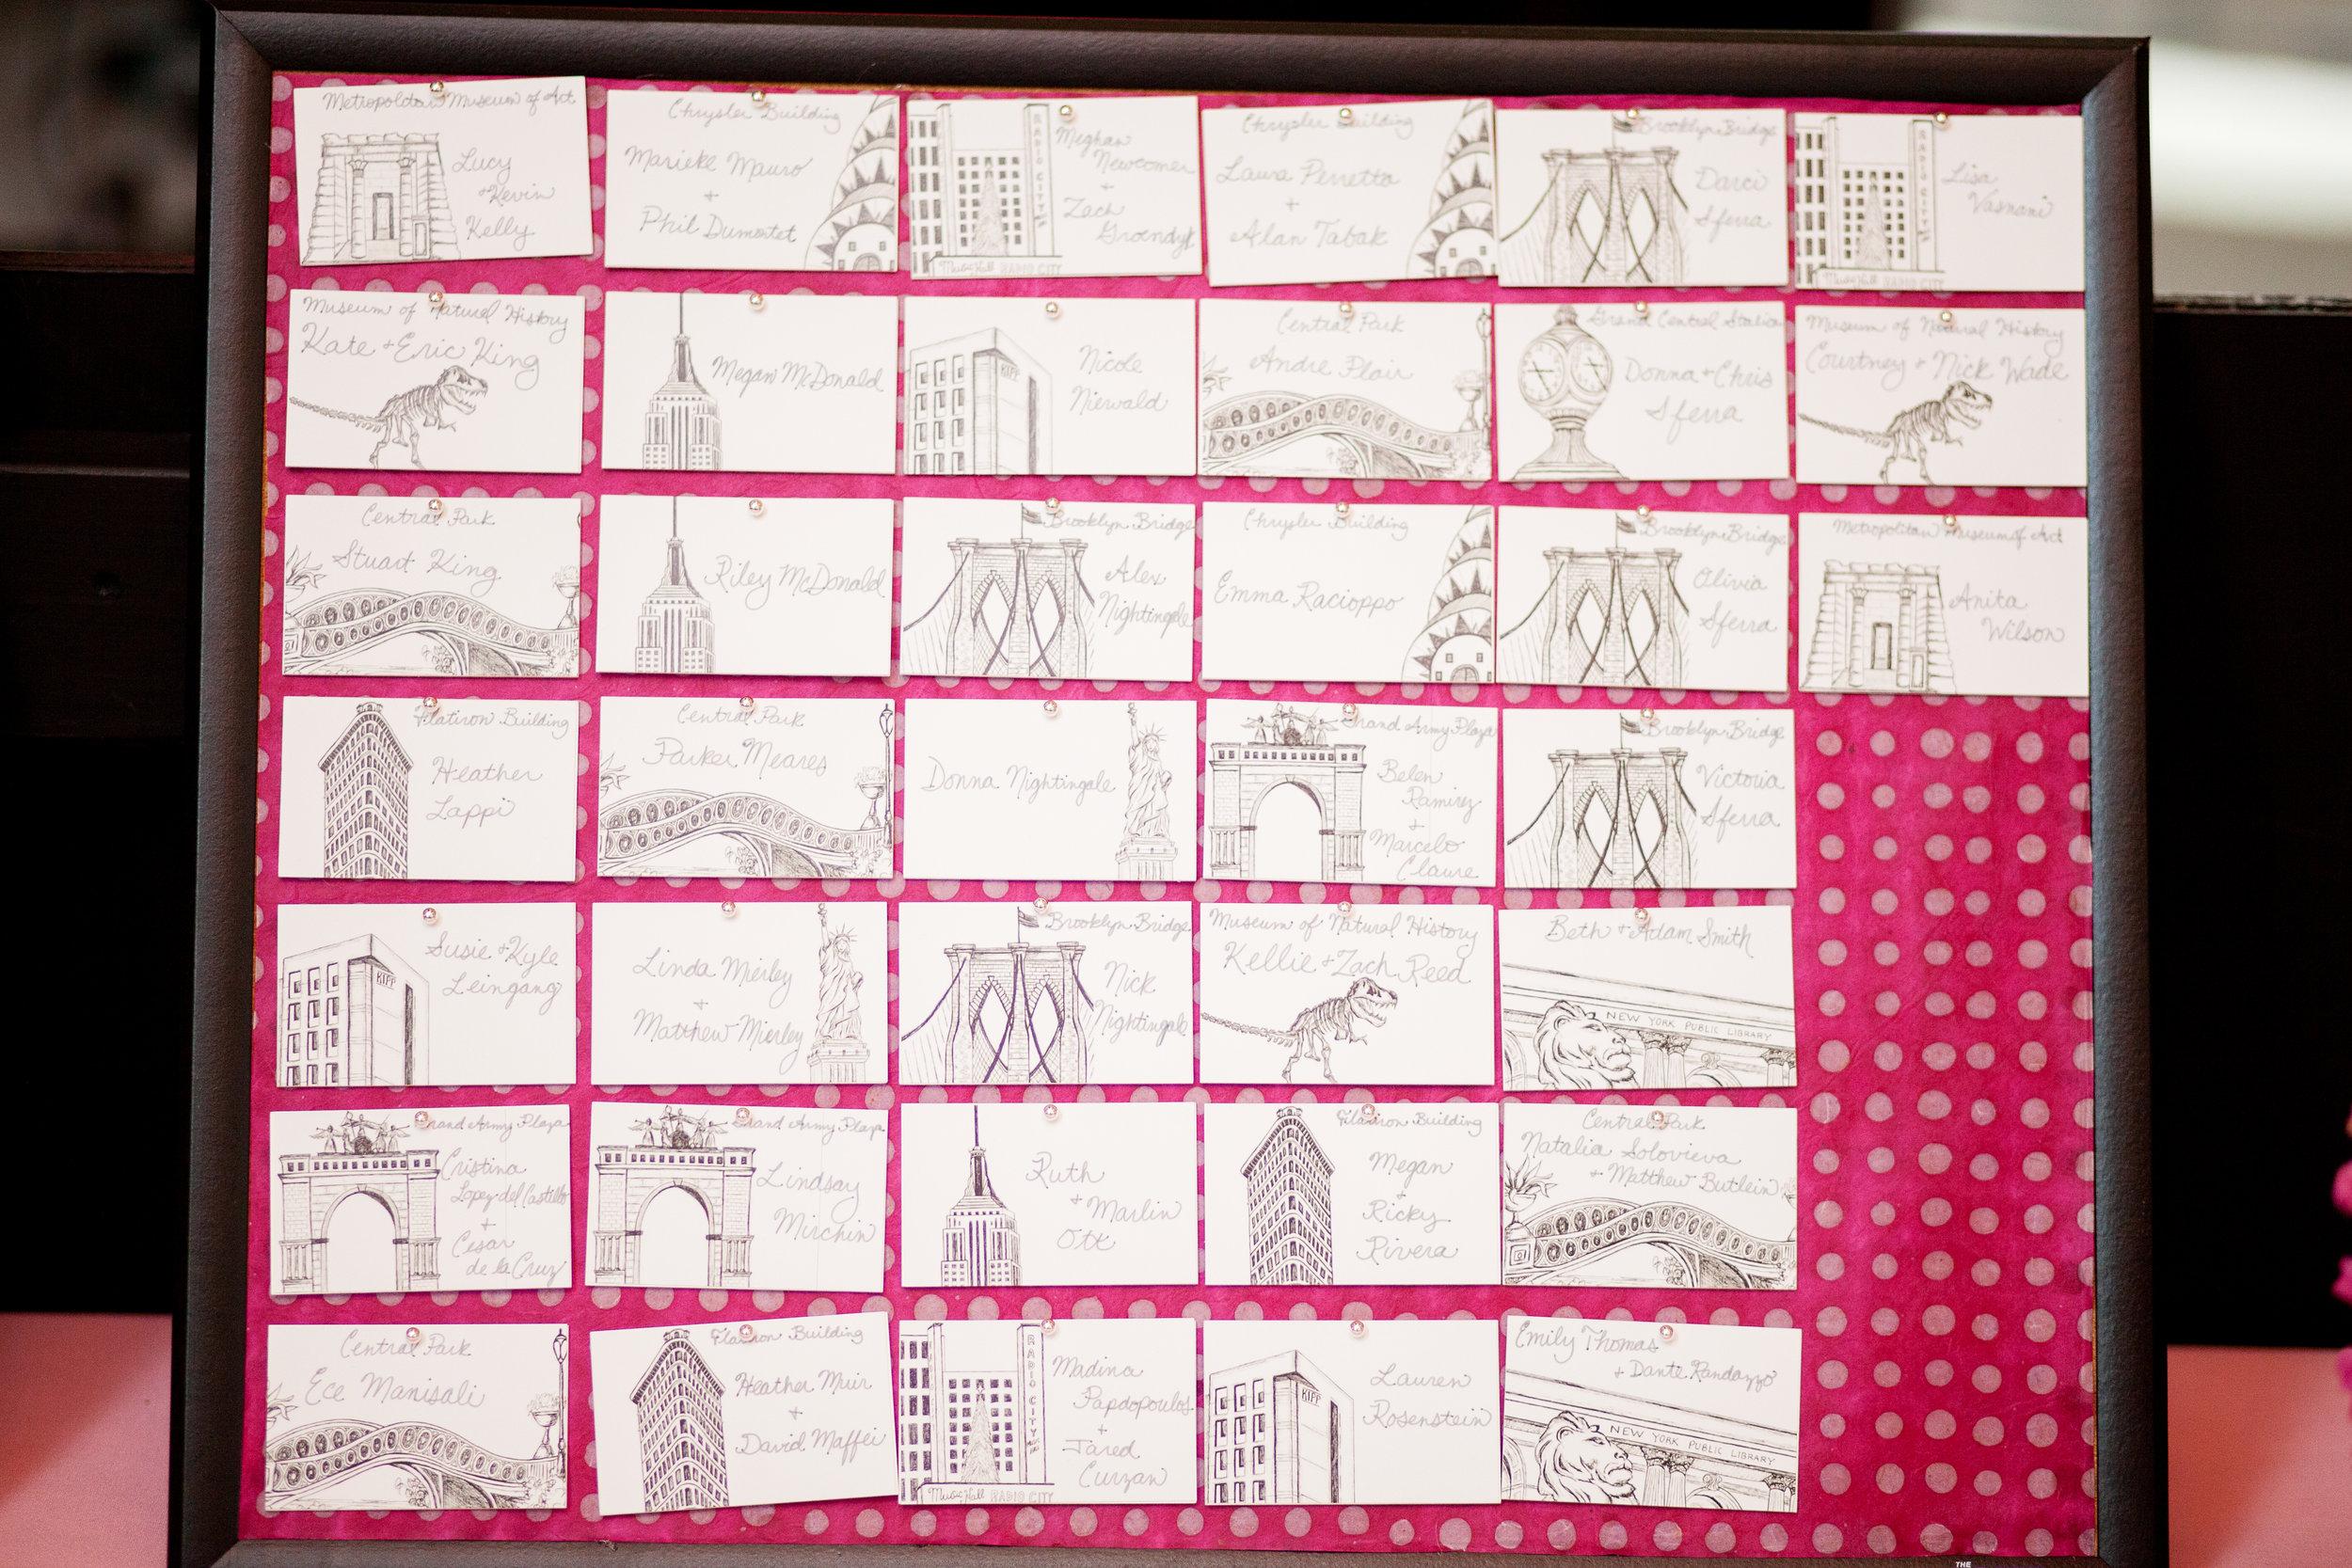 Pineapple Street Designs Stationery Illustrations for Weddings (29).jpg